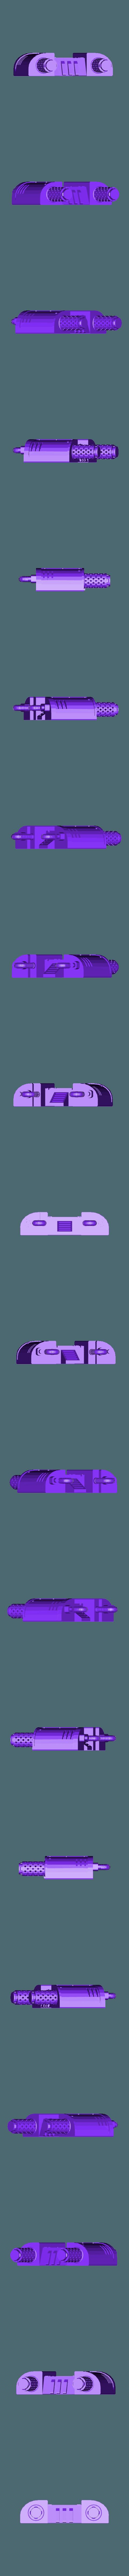 back.stl Download free STL file Super Breaking and Entering Boxy Robot • 3D printer model, bentanweihao